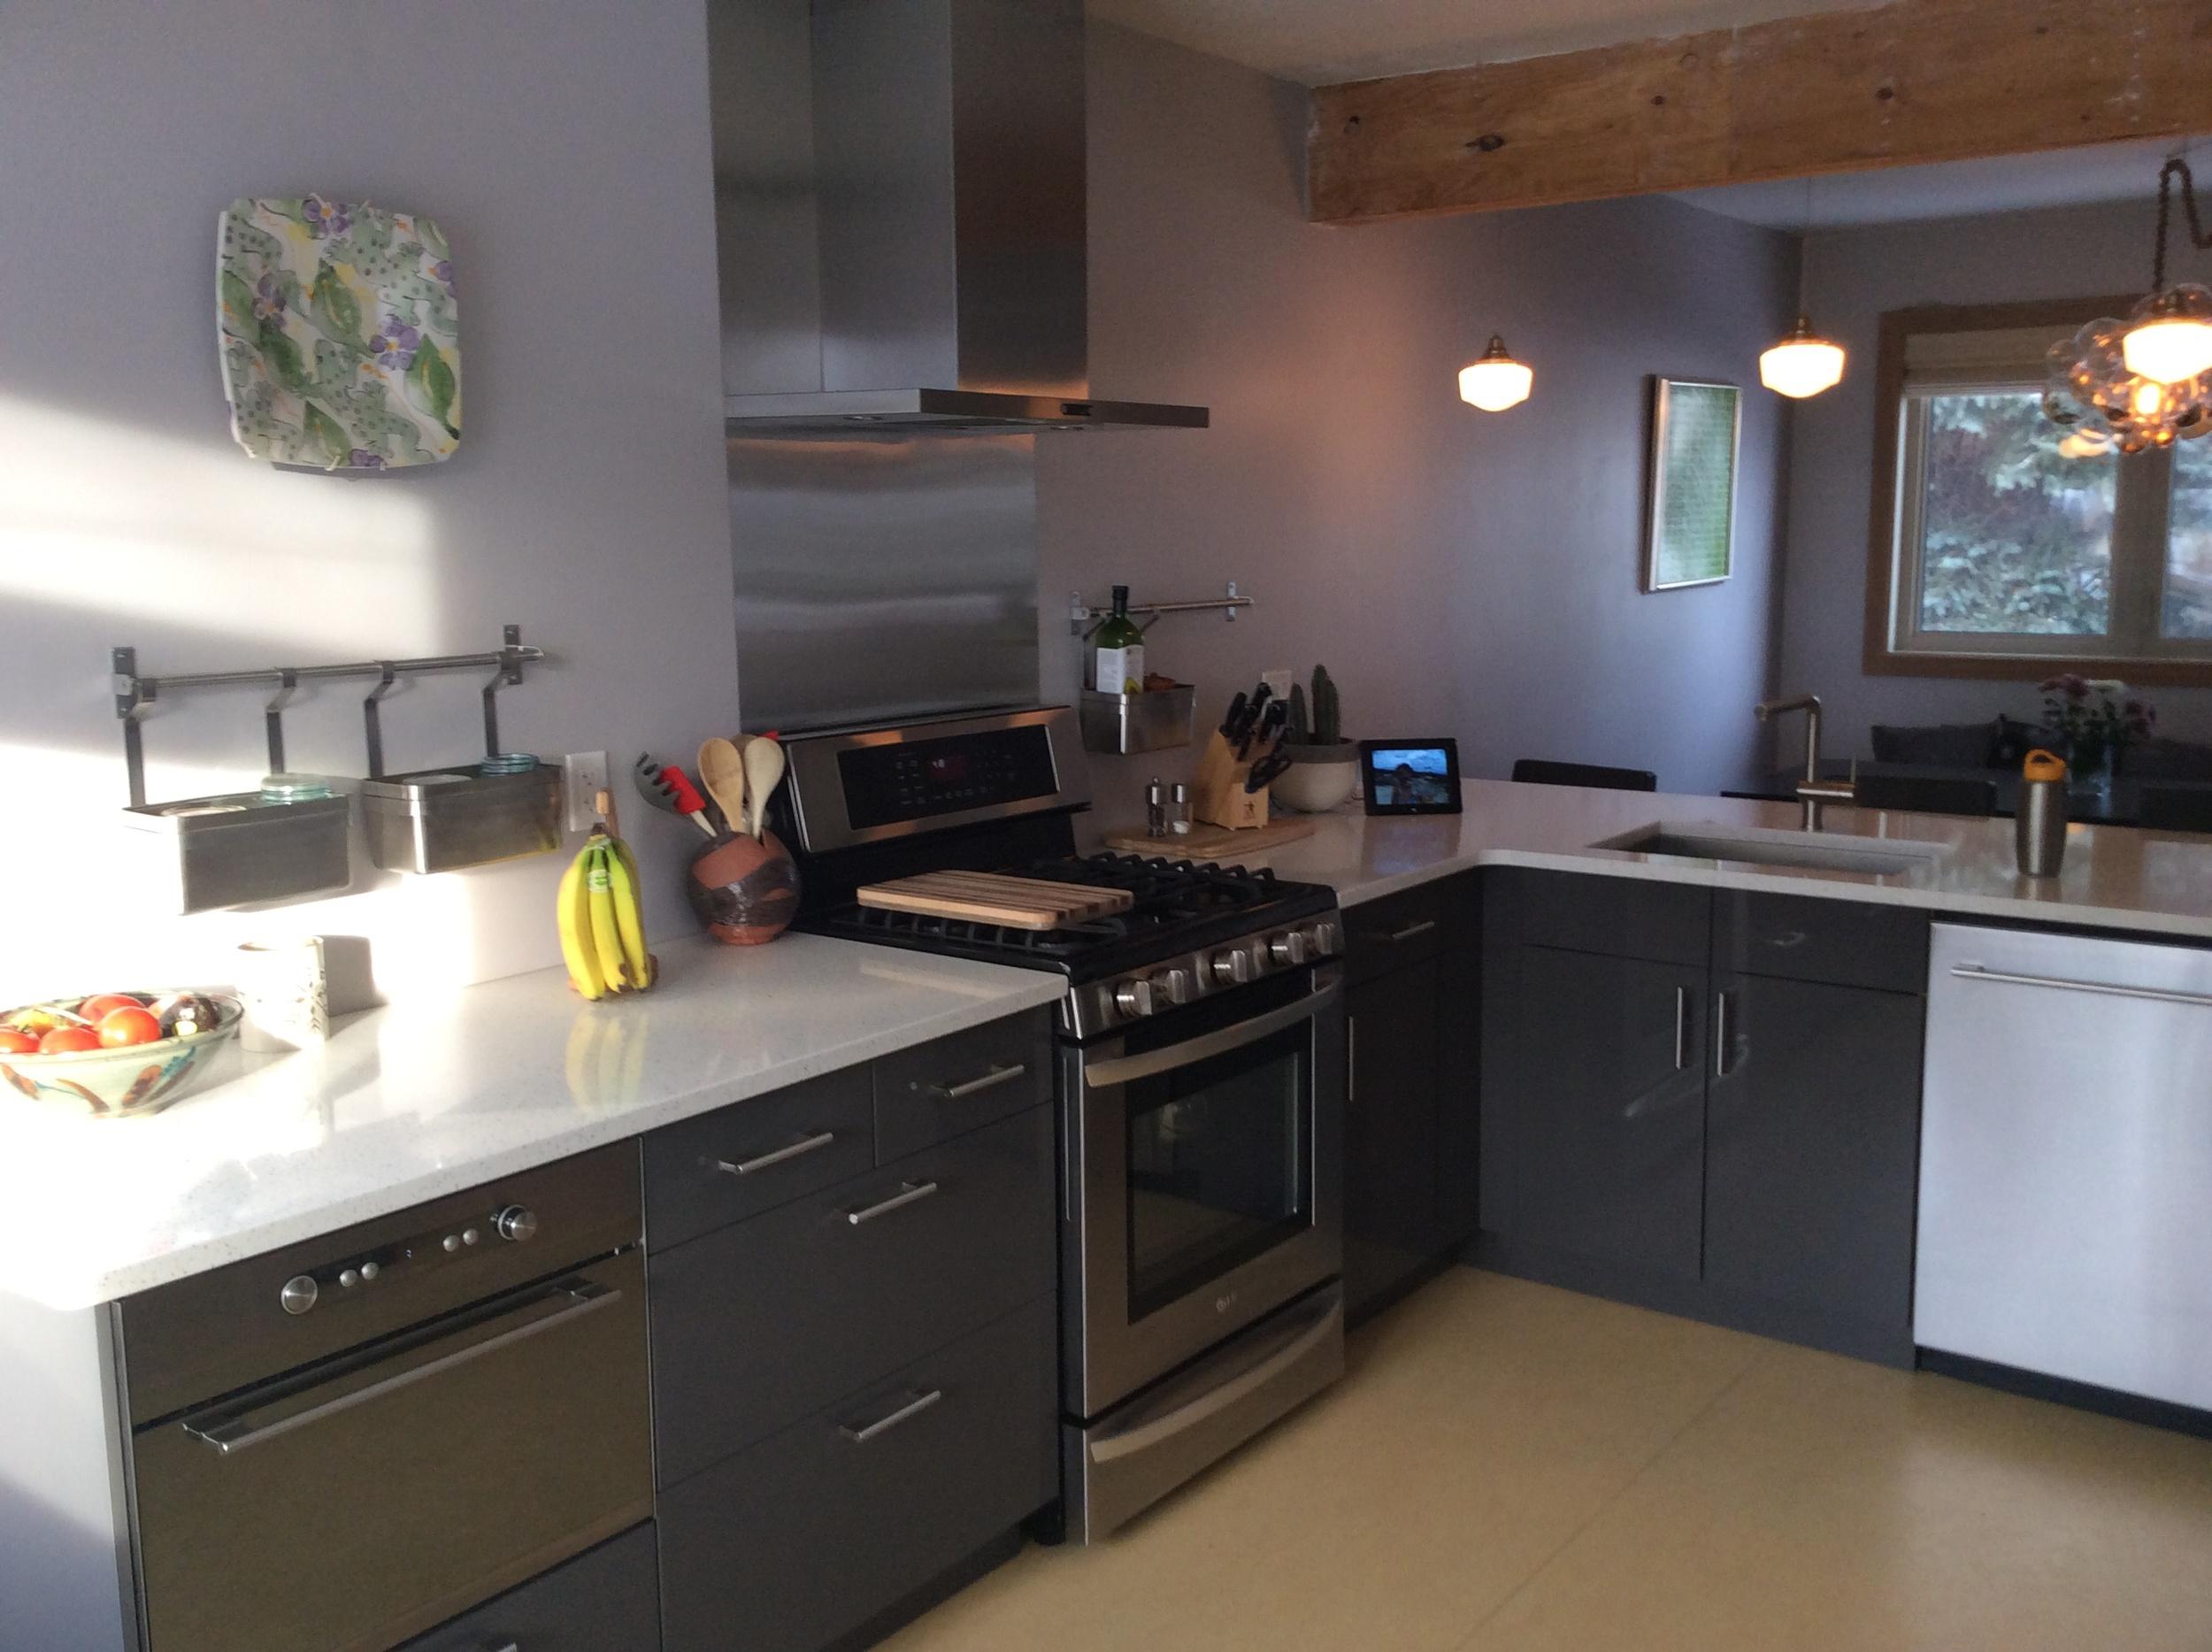 Ikea cabinets gloss grey cabinets, white quartz countertops, custom lighting.